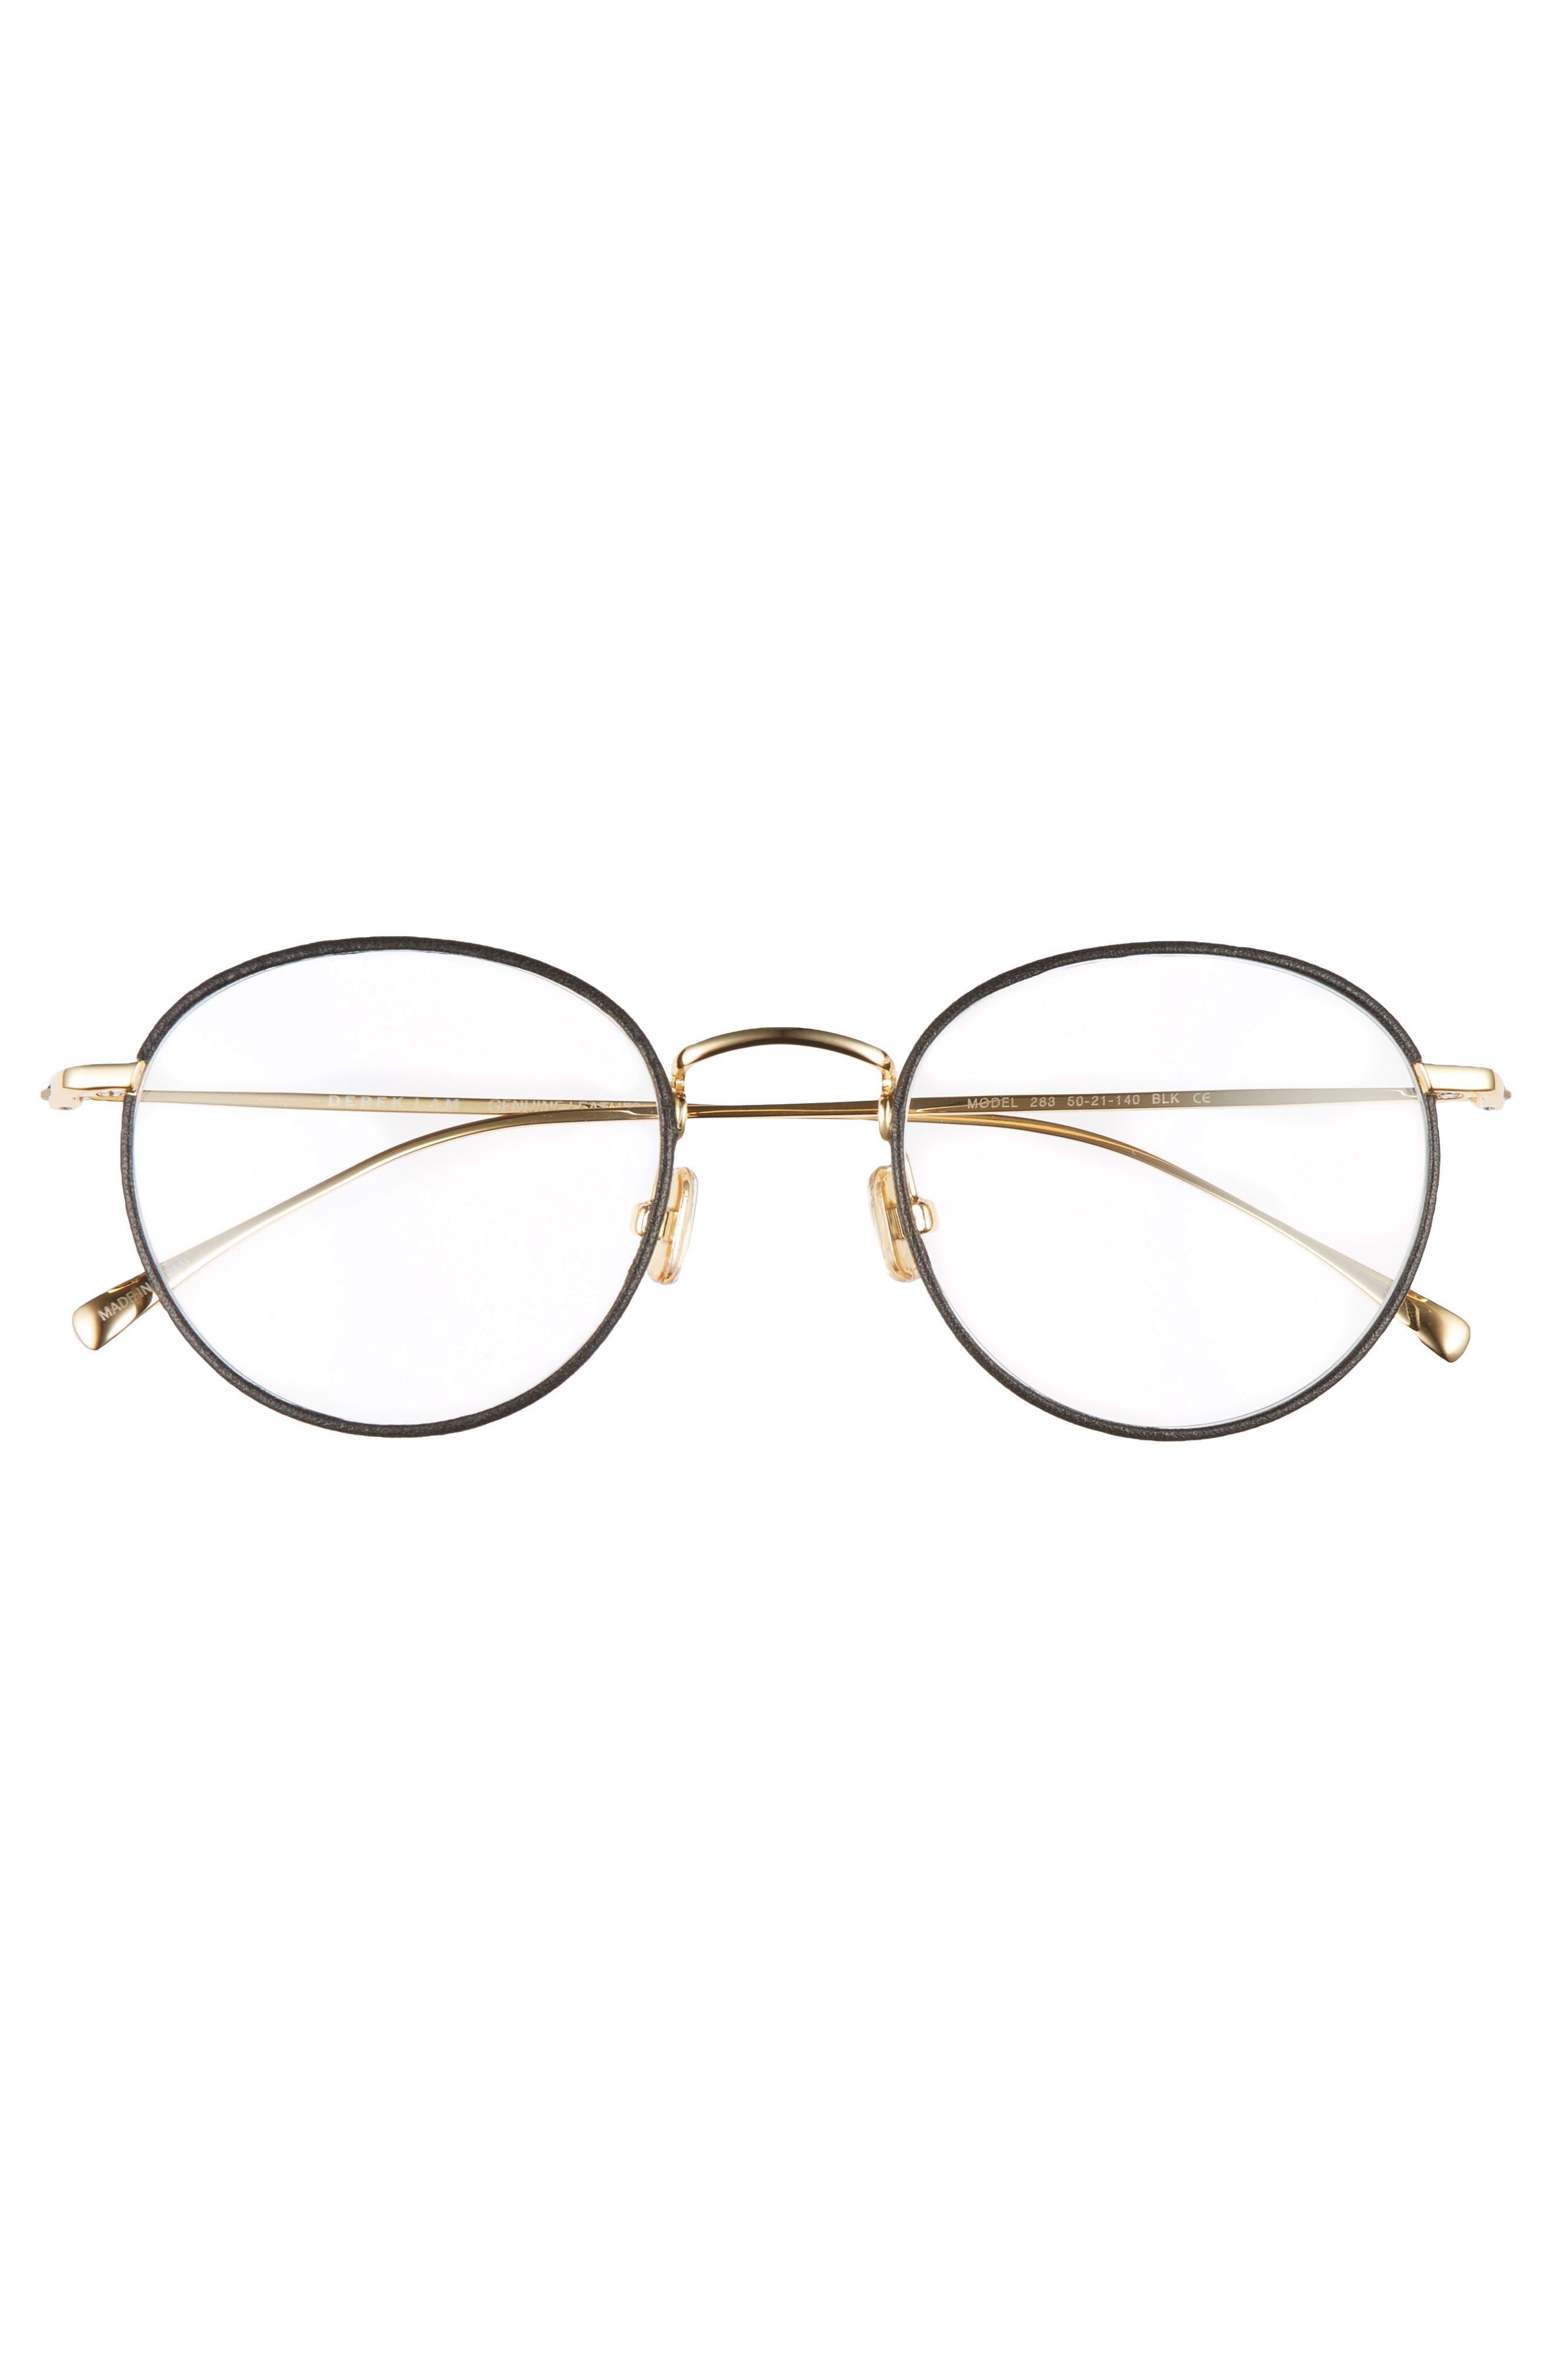 50mm Optical Glasses,                             Alternate thumbnail 3, color,                             BLACK